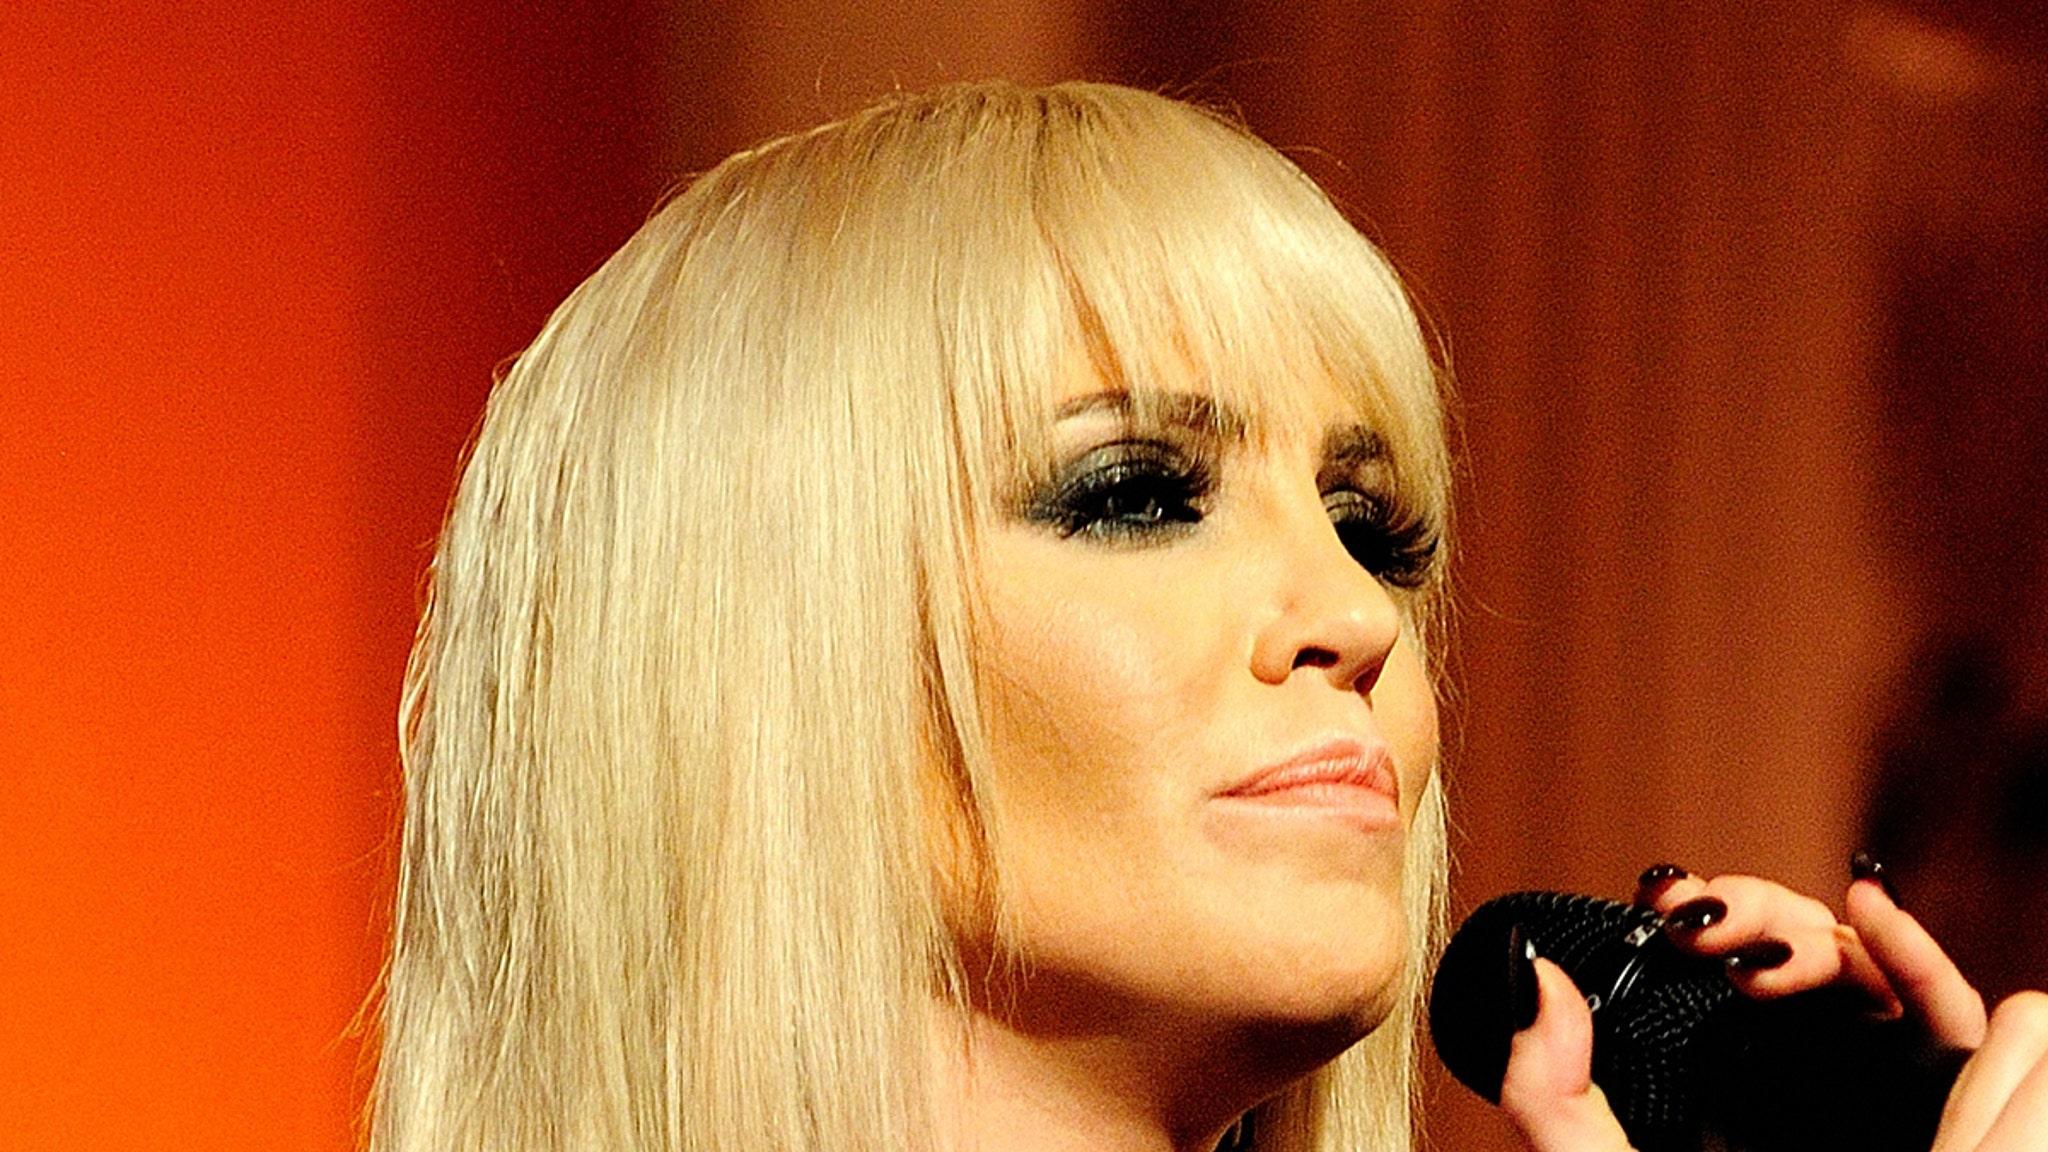 Girls Aloud Singer Sarah Harding Dead at 39 from Breast Cancer – TMZ